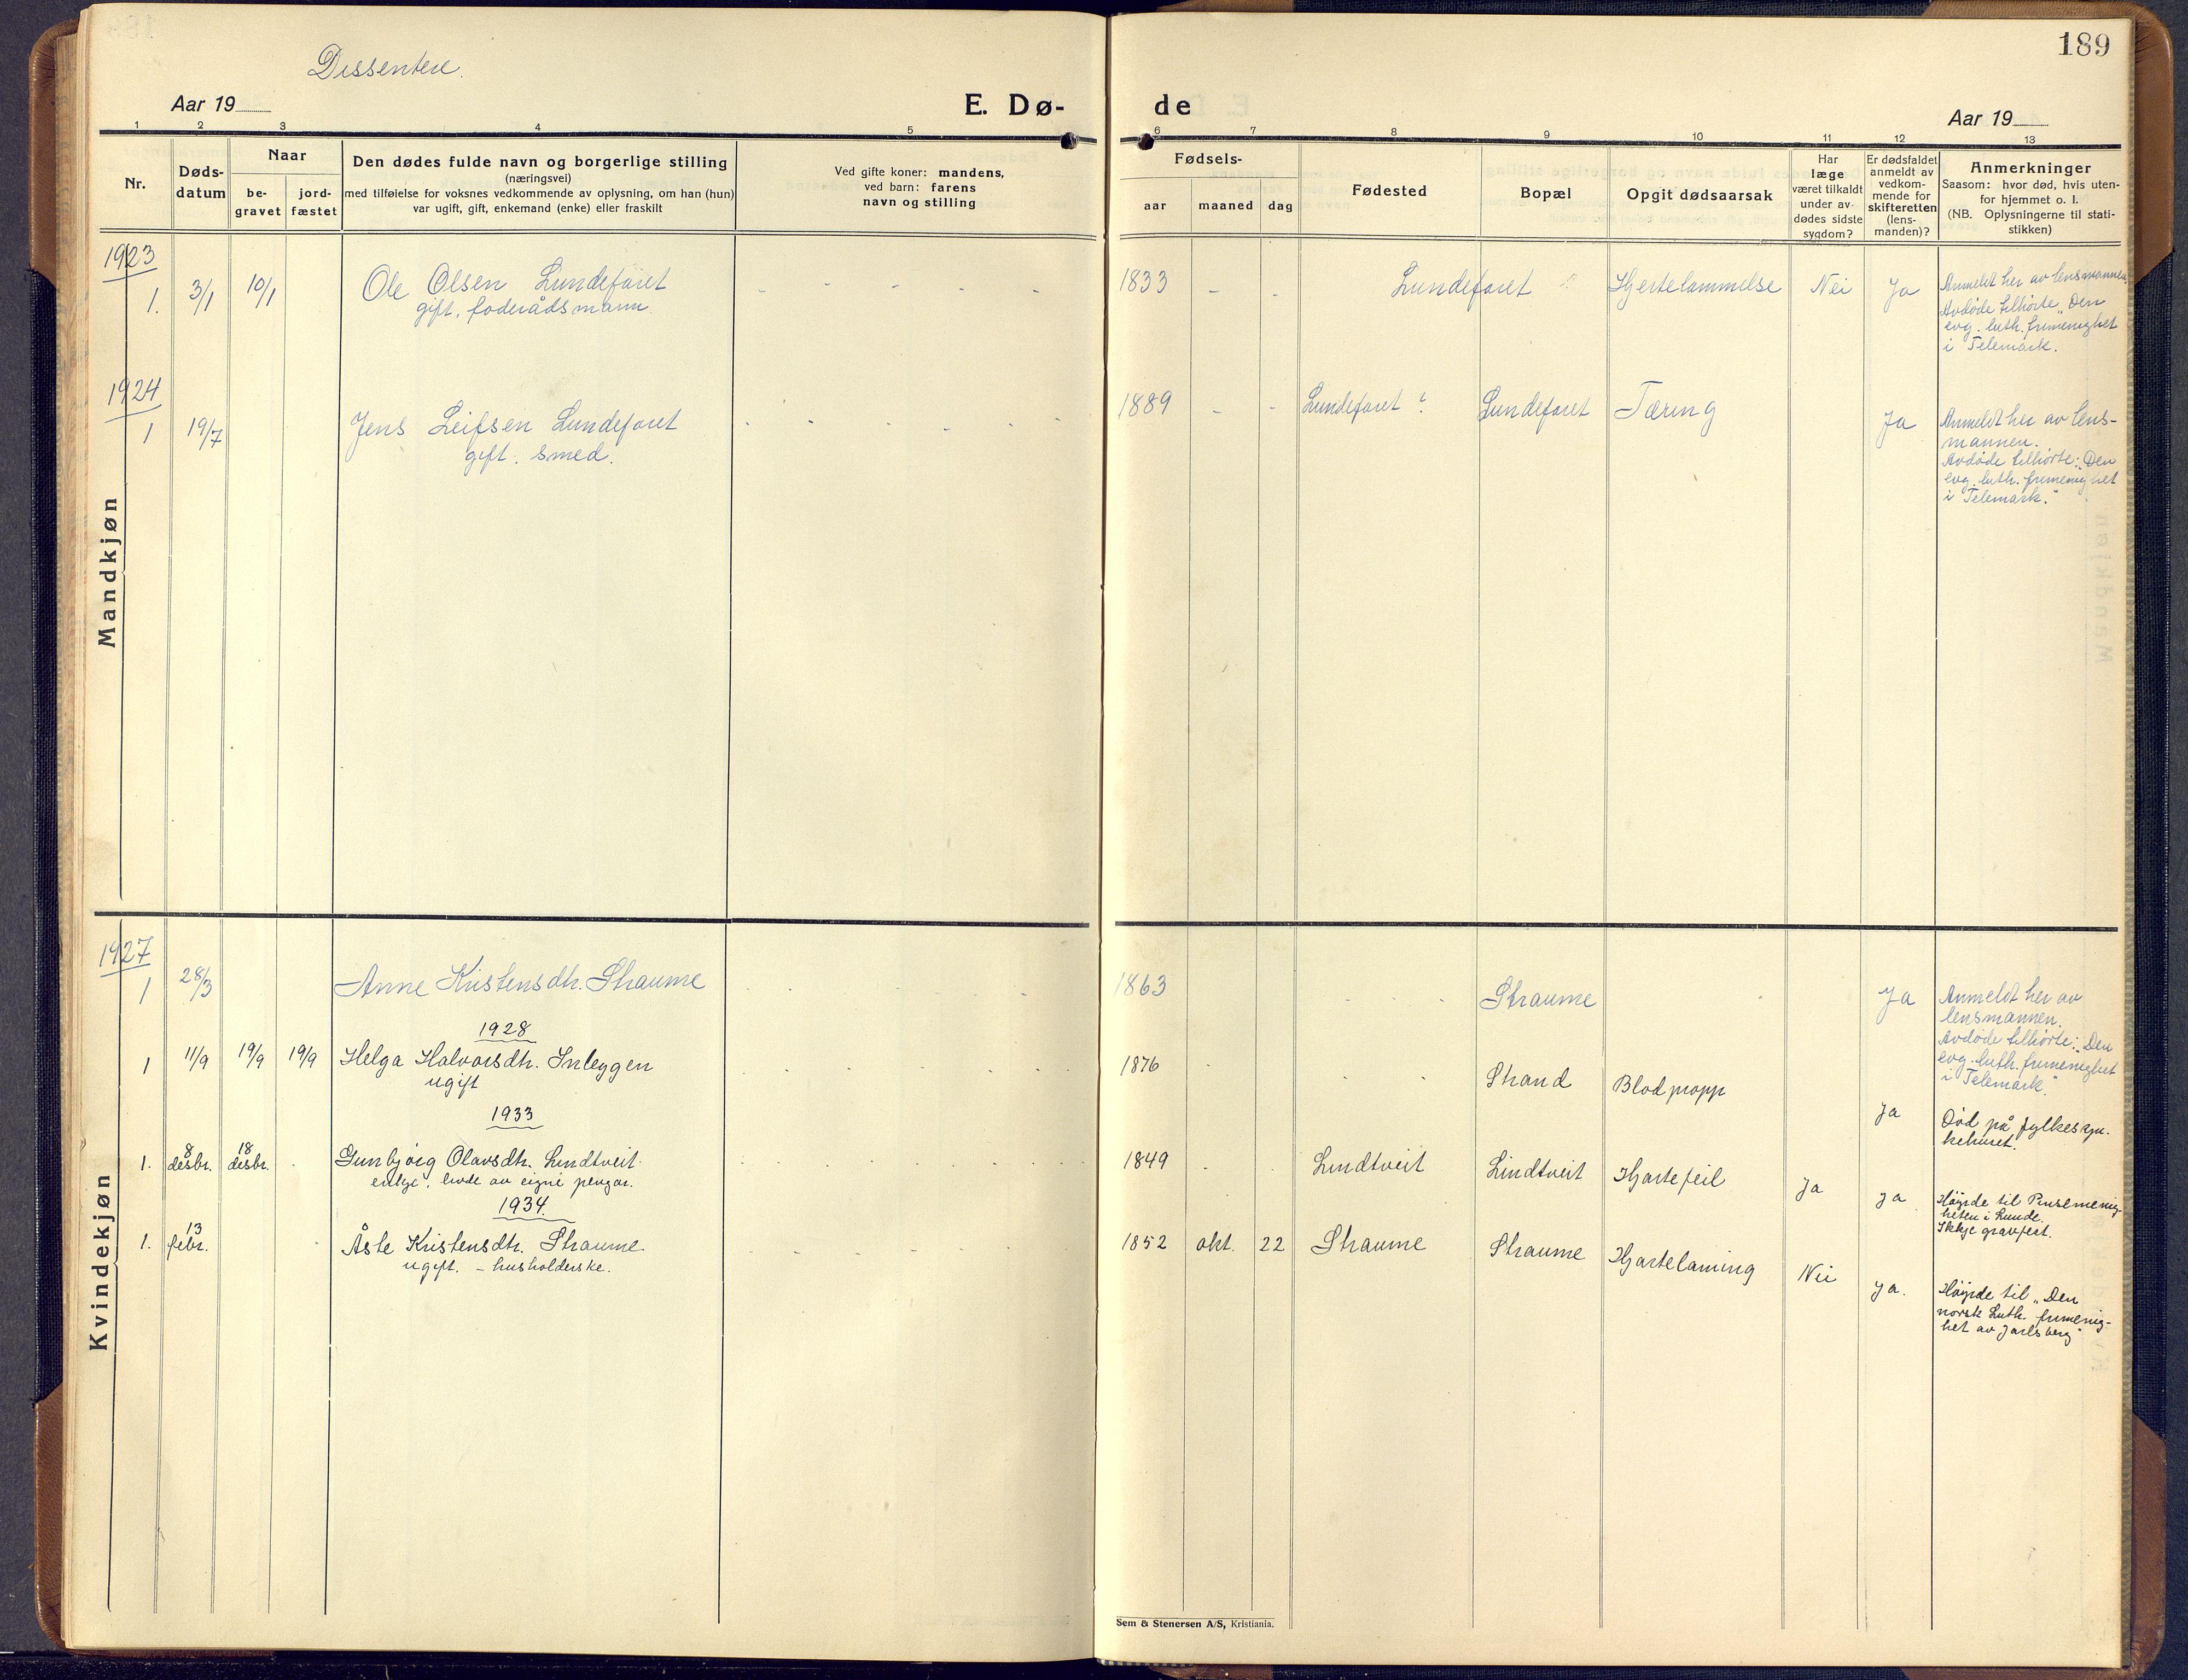 SAKO, Lunde kirkebøker, F/Fa/L0006: Ministerialbok nr. I 6, 1922-1940, s. 189